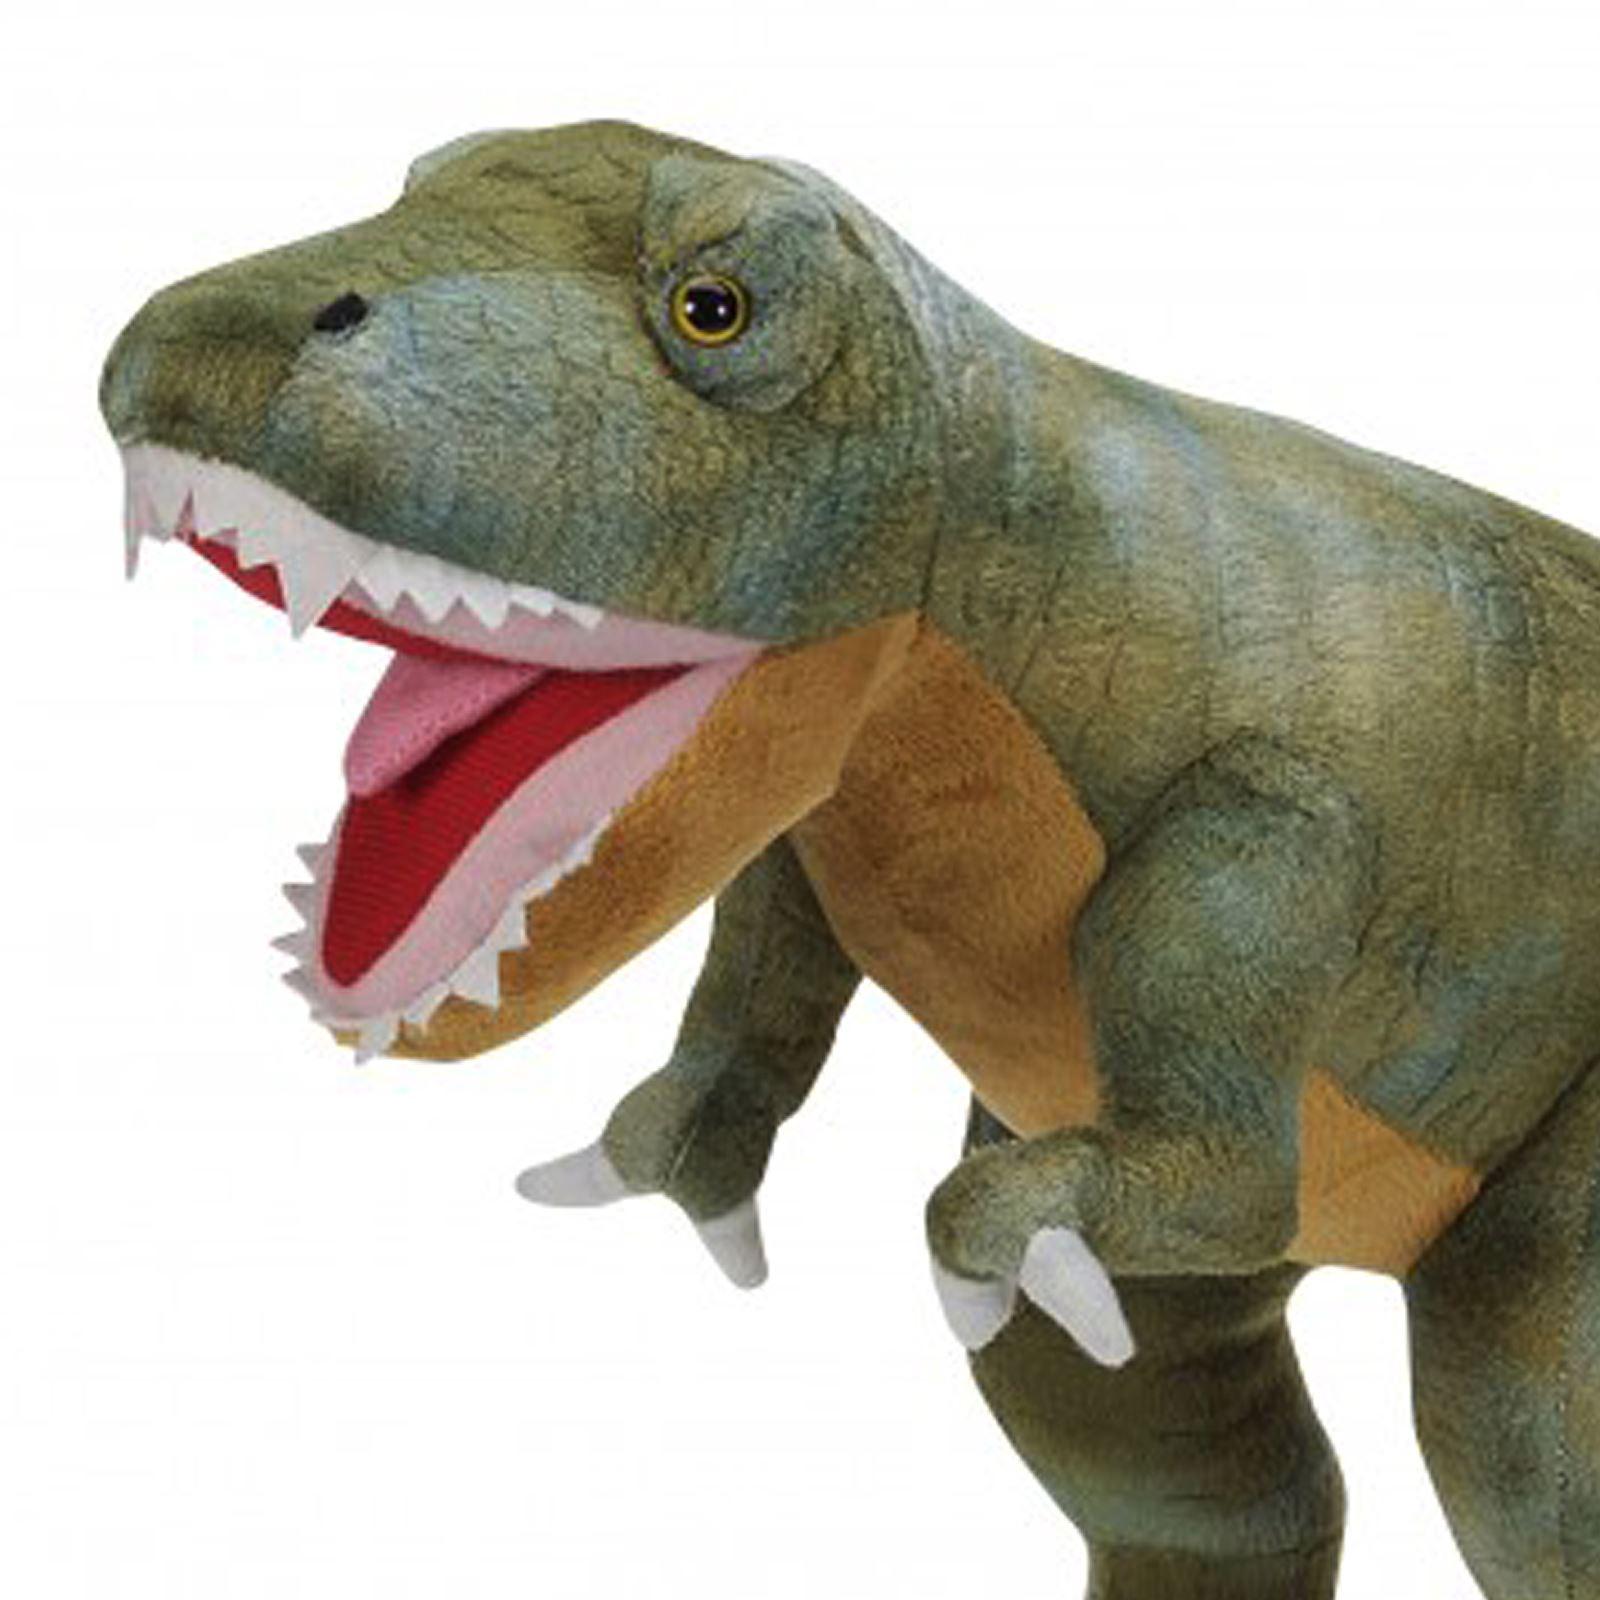 Large Soft Plush Dinosaur Toy Kids Cuddly Stuffed Animal T